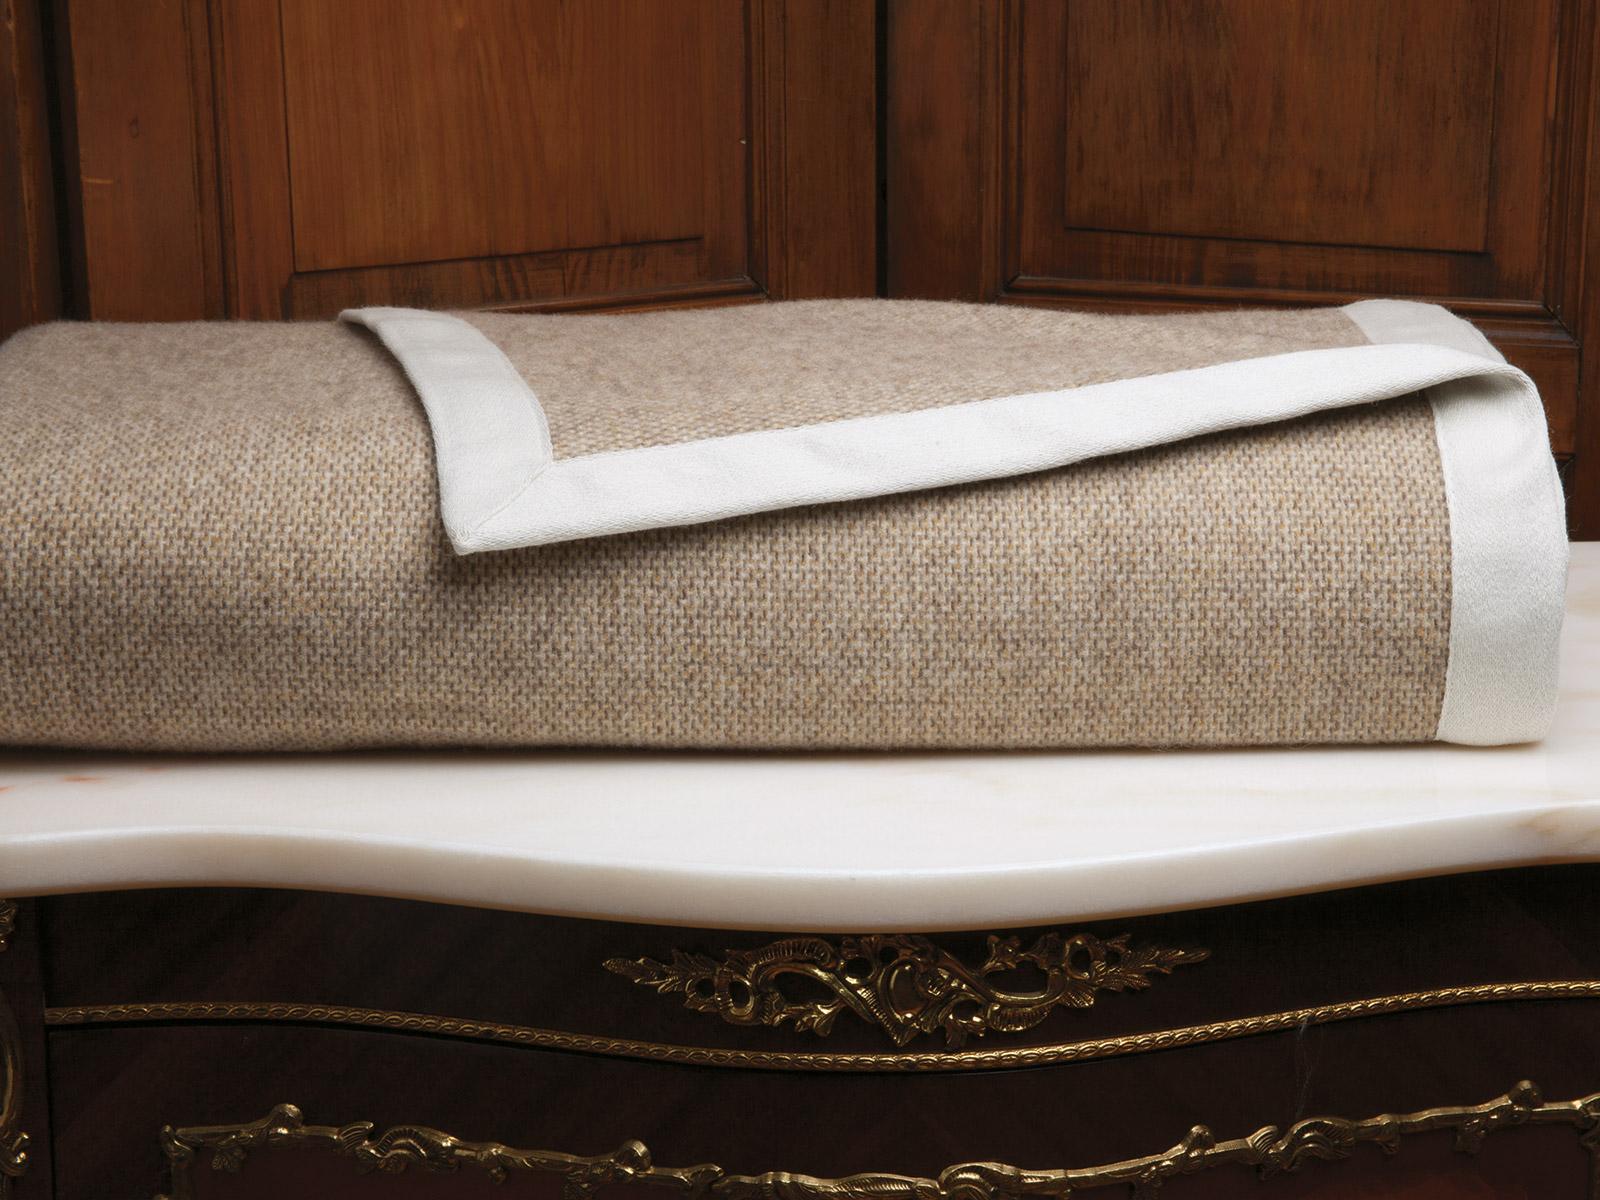 San Merino Blankets Luxury Bedding Italian Bed Linens